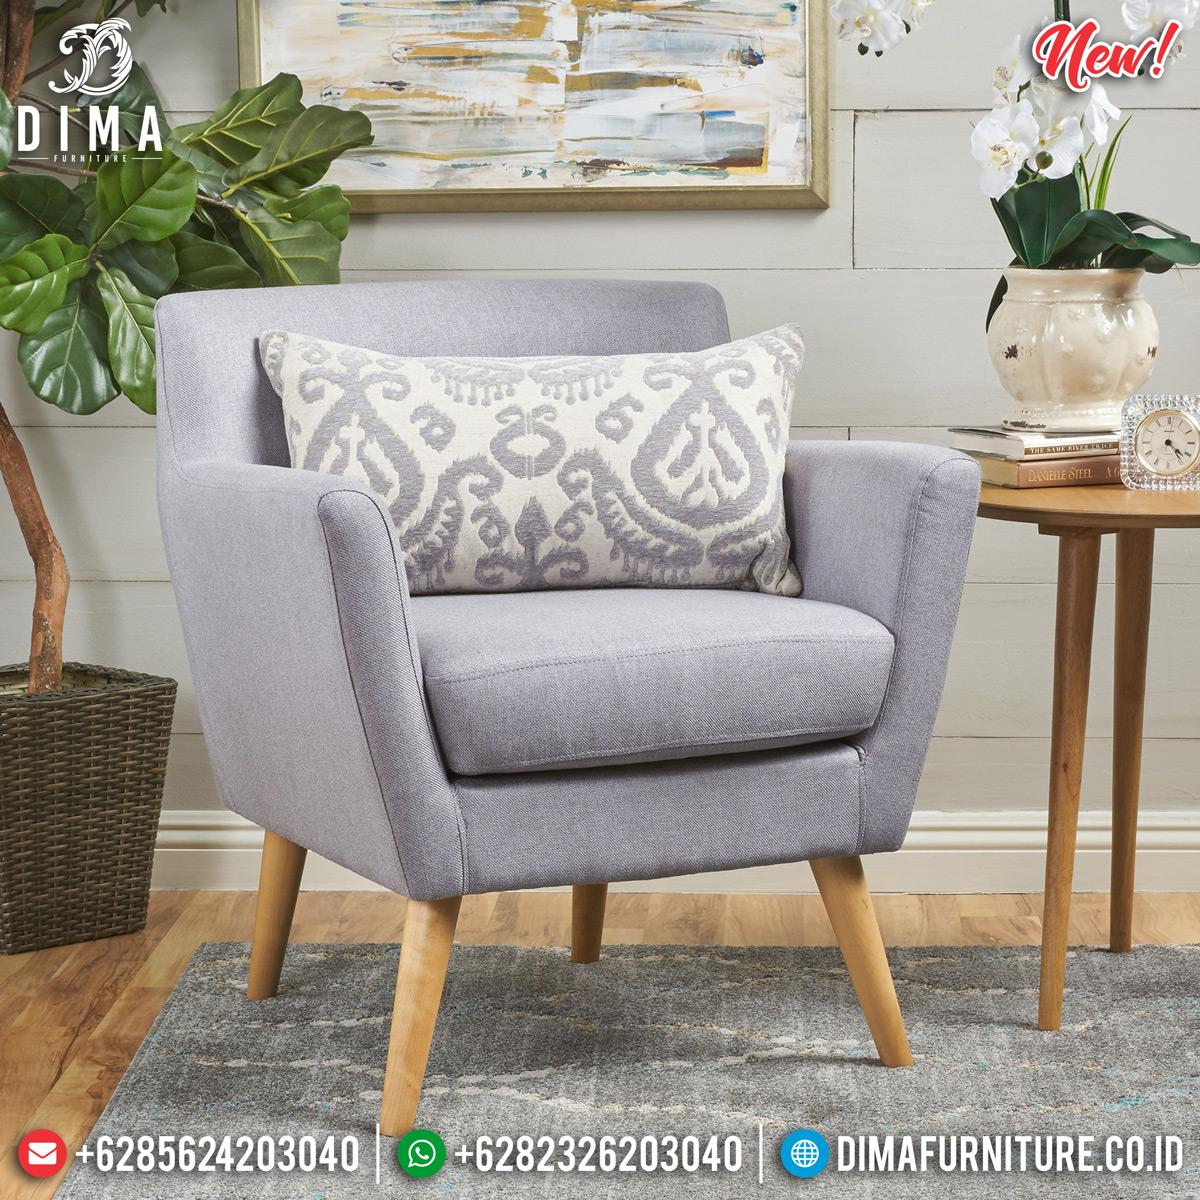 New Model Sofa Minimalis Single Epic Design Upholstery BT-0735 Model1